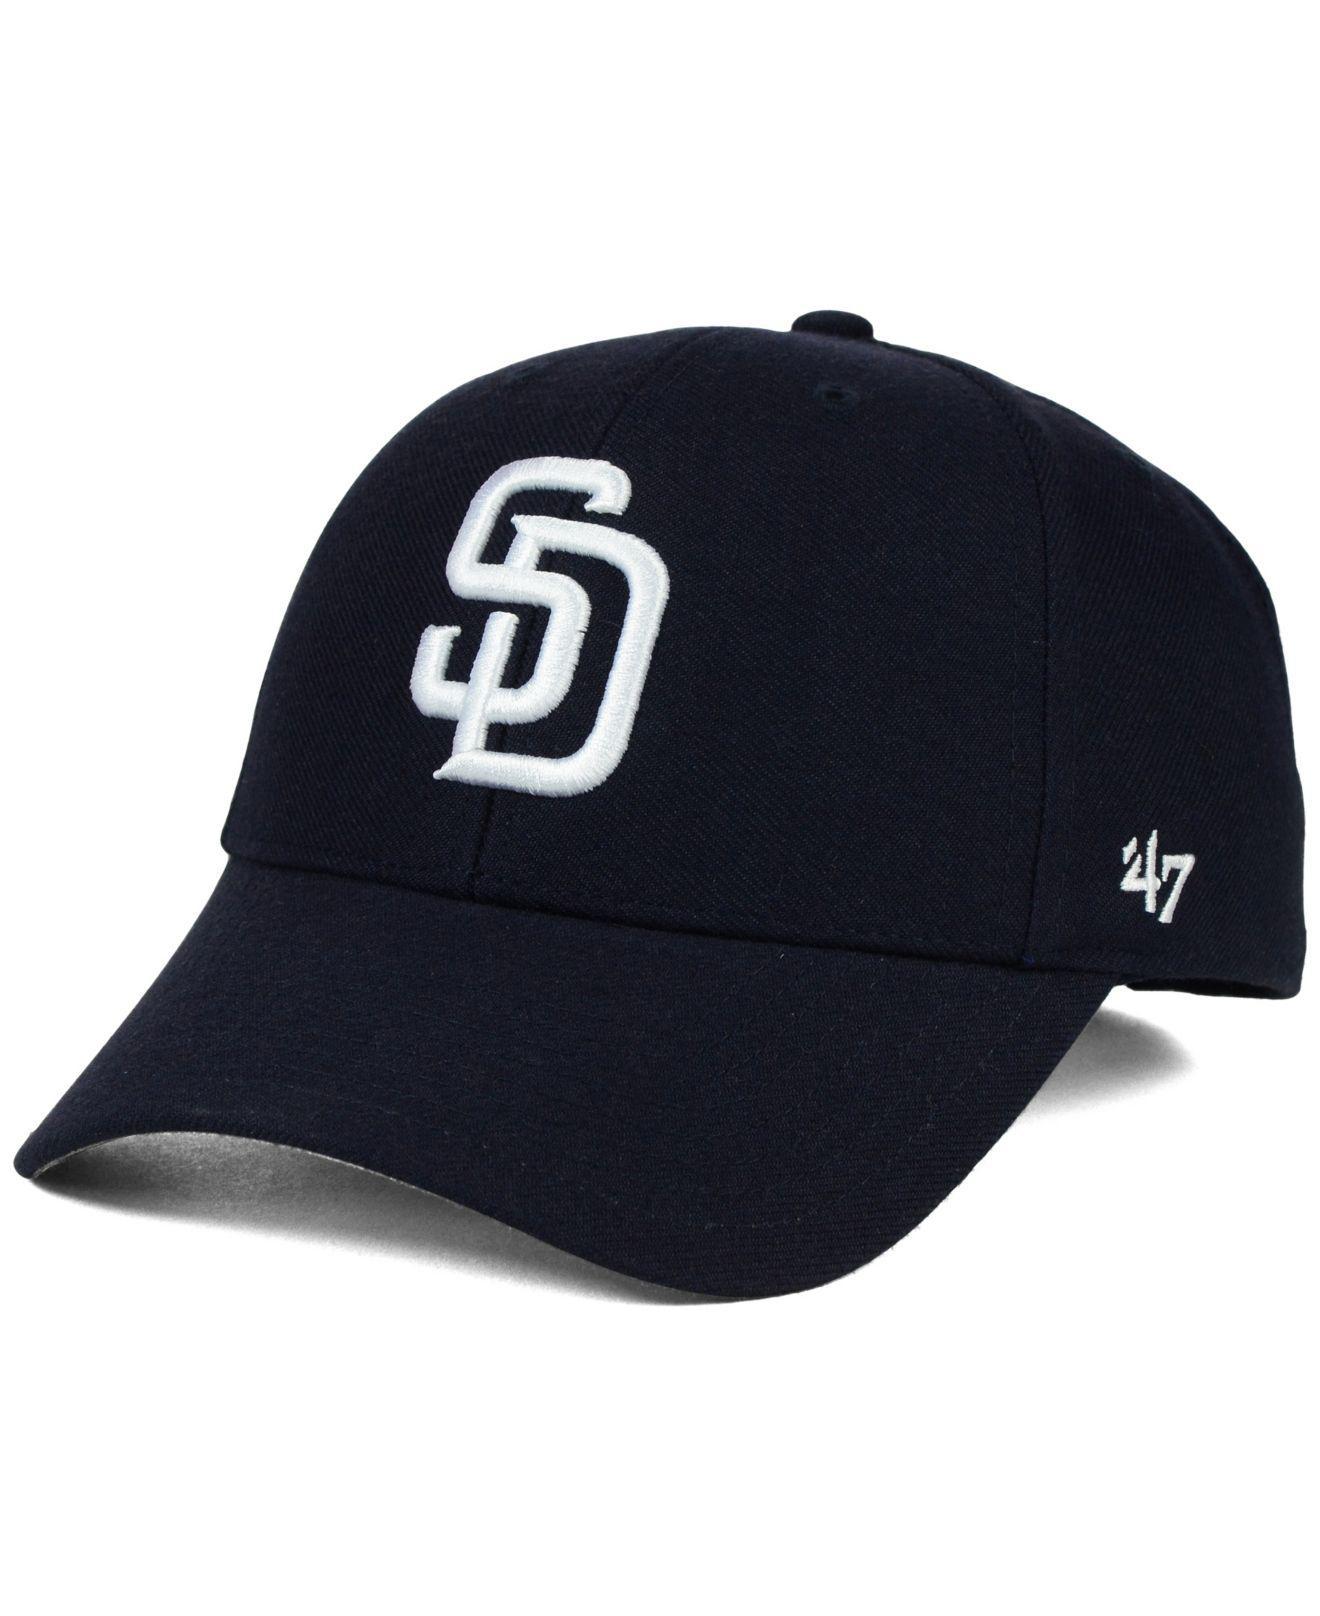 3068363ab86f0 Lyst - 47 Brand San Diego Padres Mlb On Field Replica Mvp Cap in ...